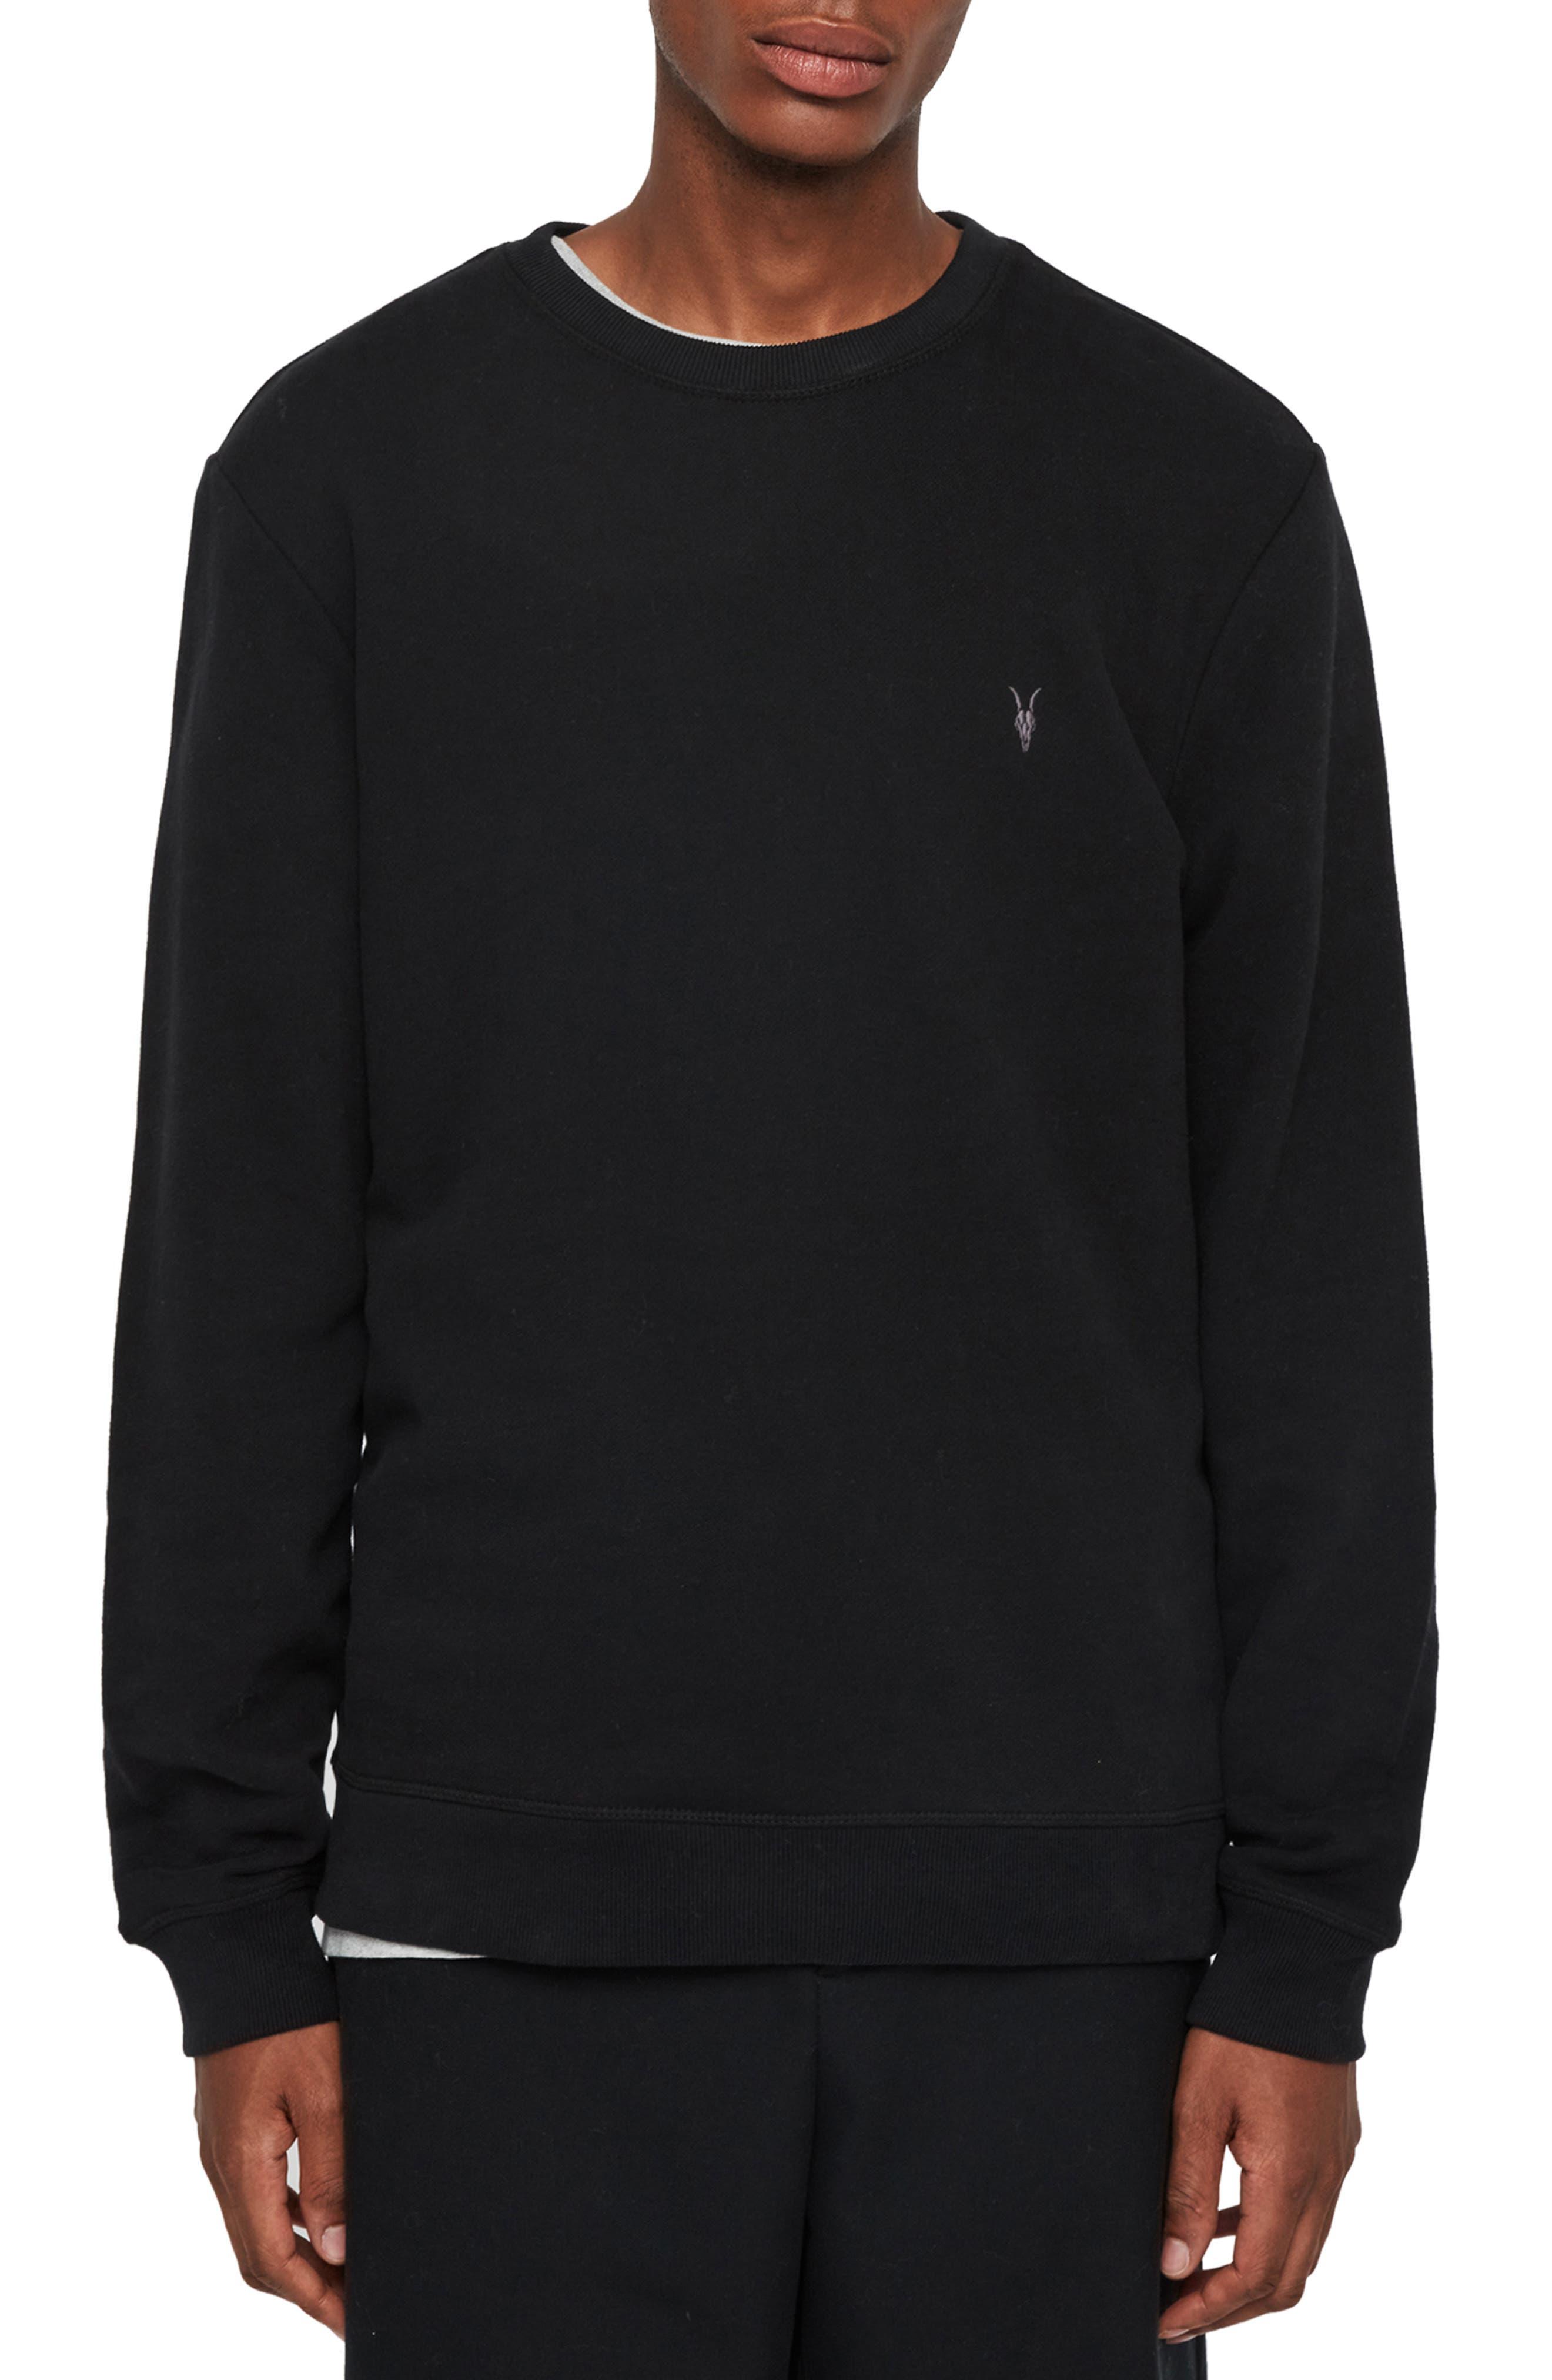 Raven Slim Fit Crewneck Sweatshirt